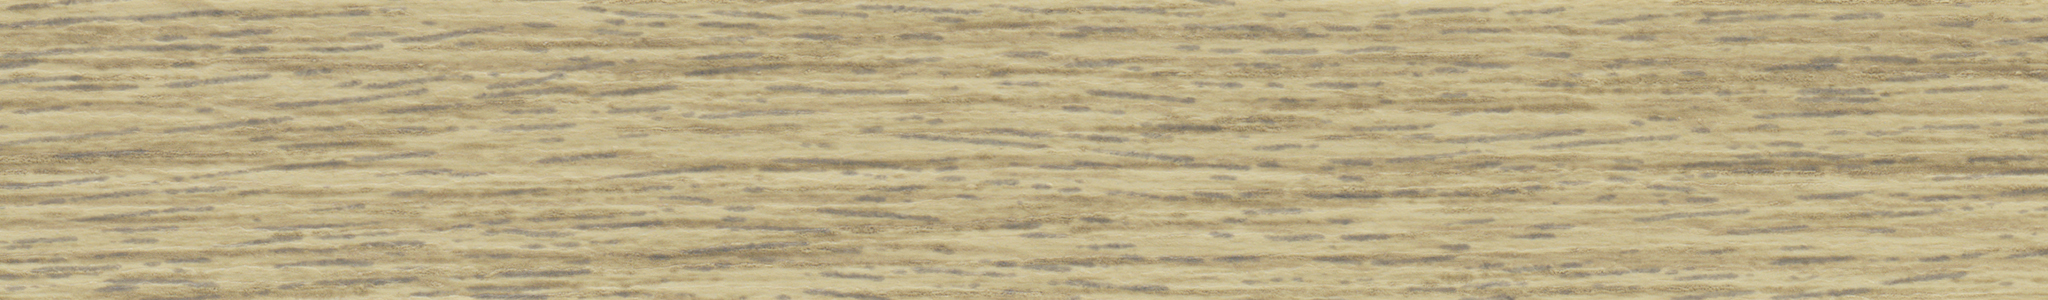 HD 240119 ABS Edge American Oak Pore